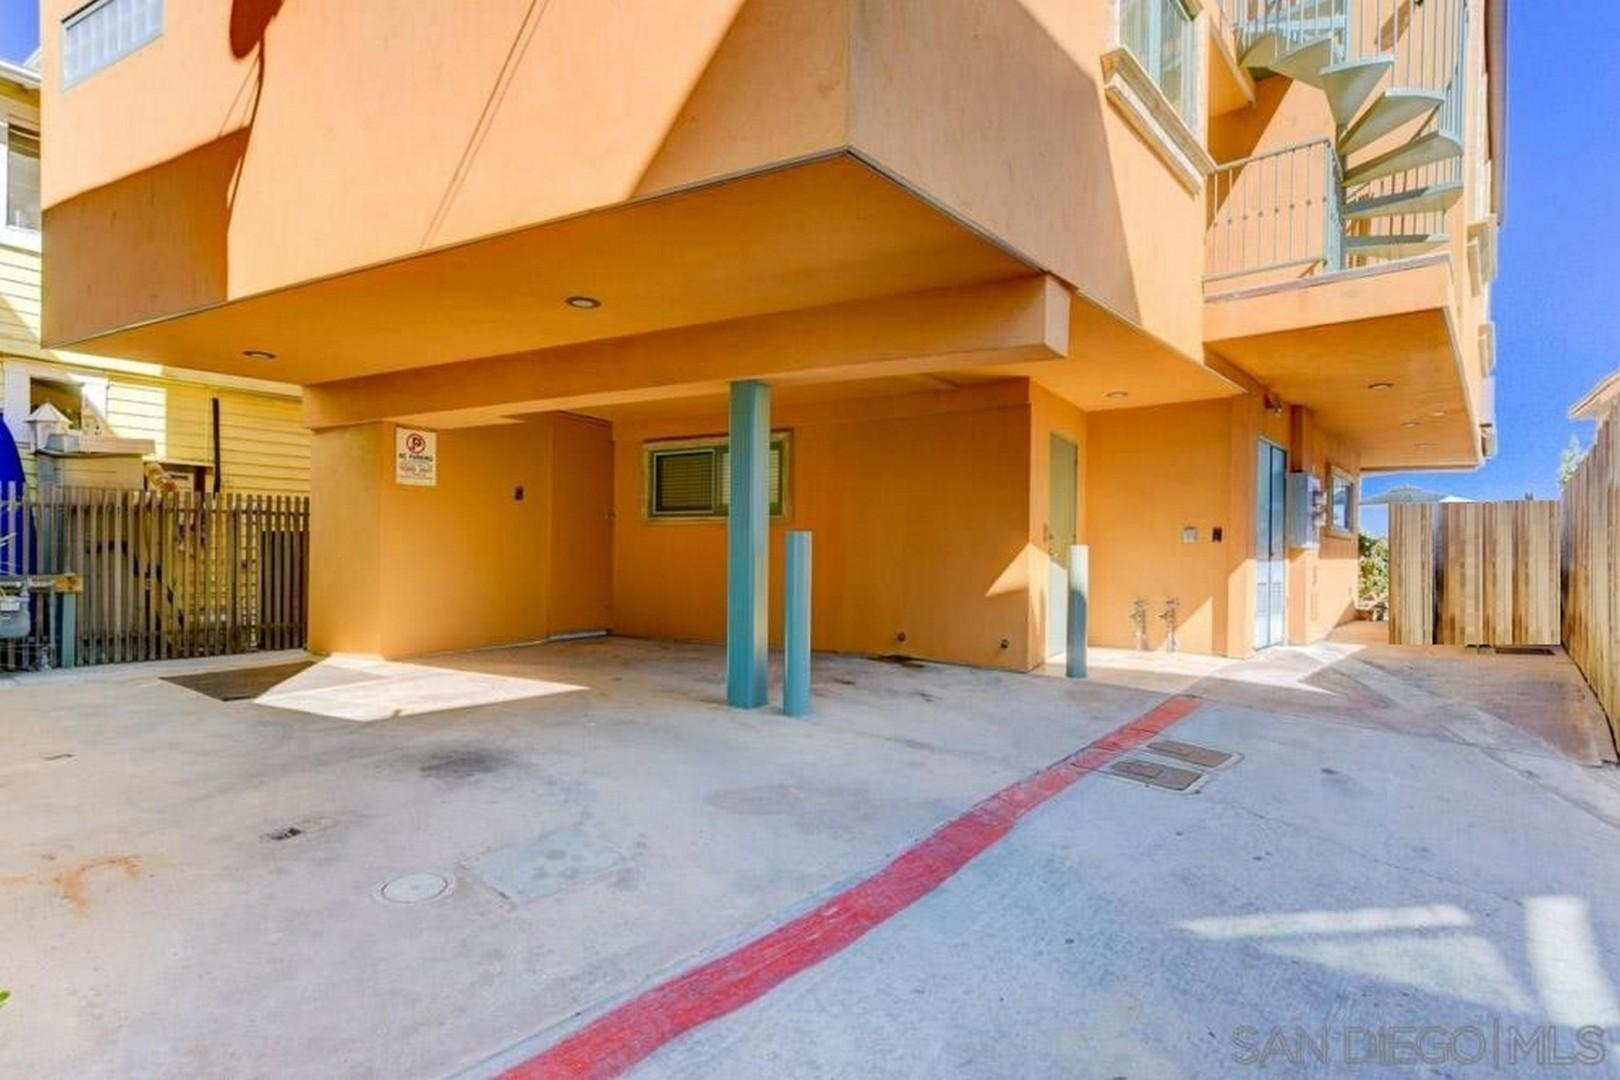 3792-Bayside-Walk-San-DiegoNOFENCE